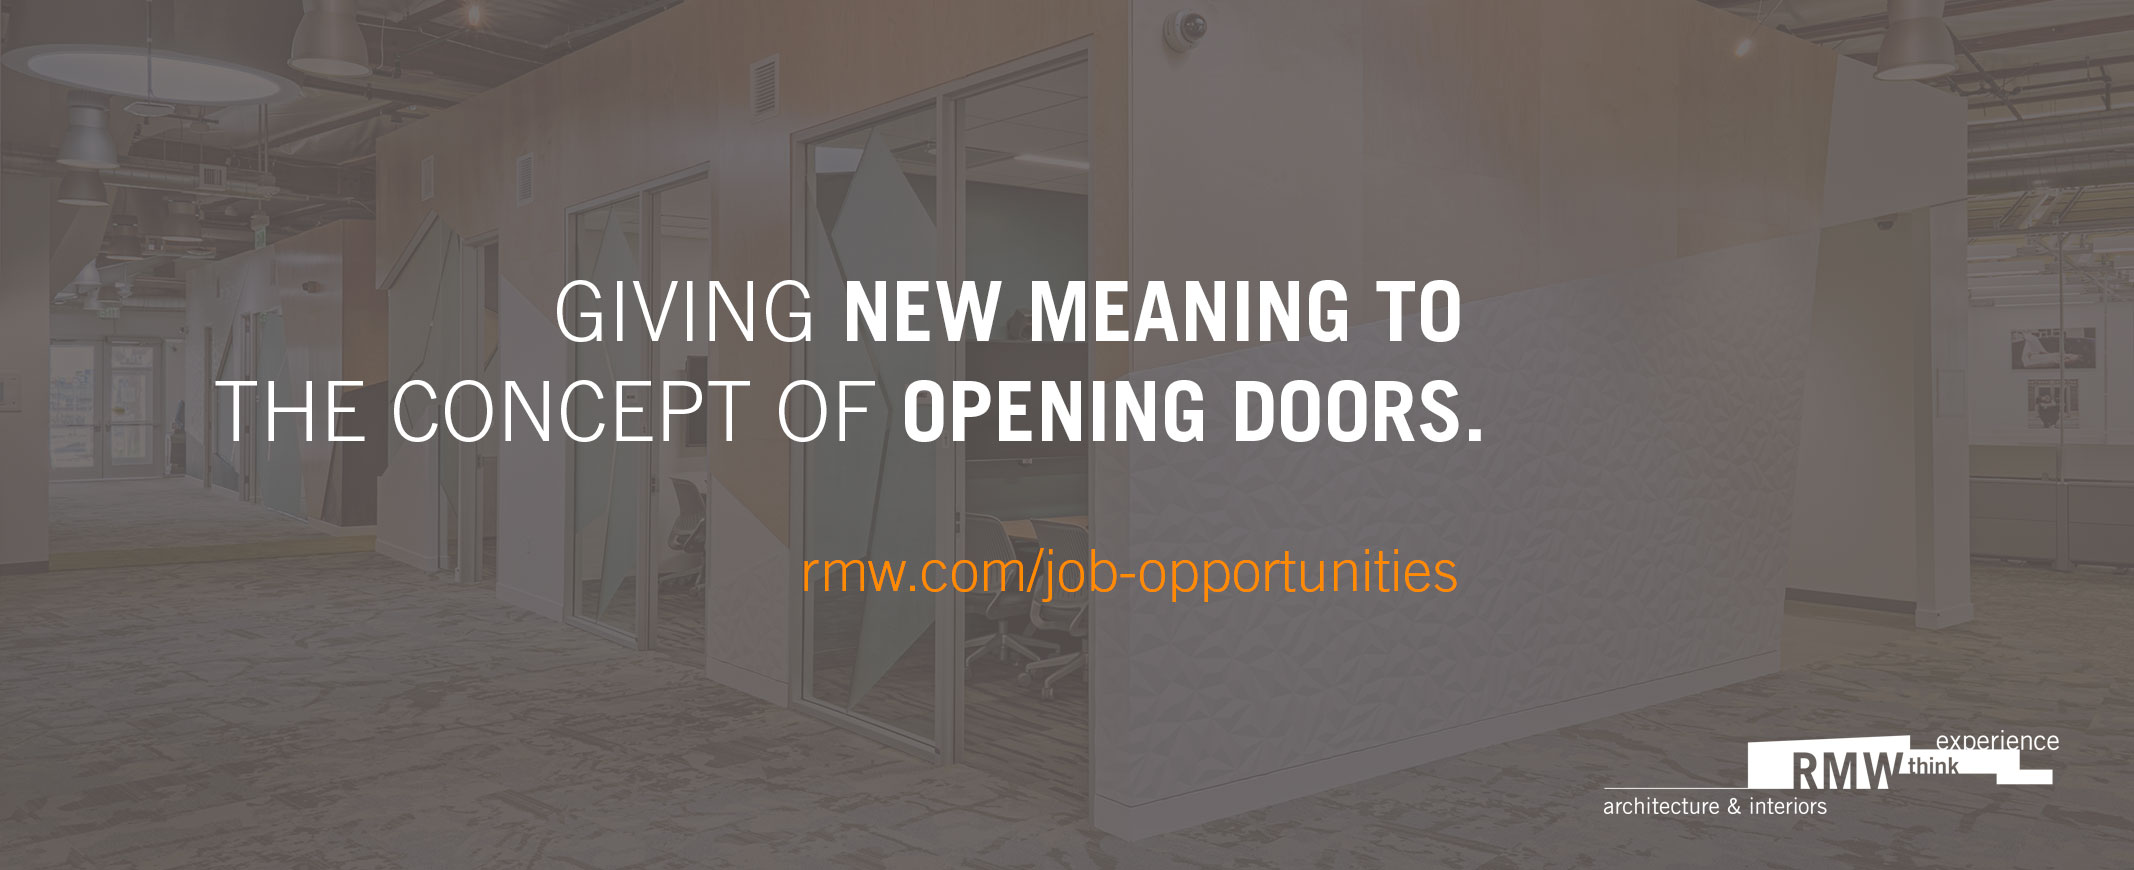 Job-Oppornities-Banner-1